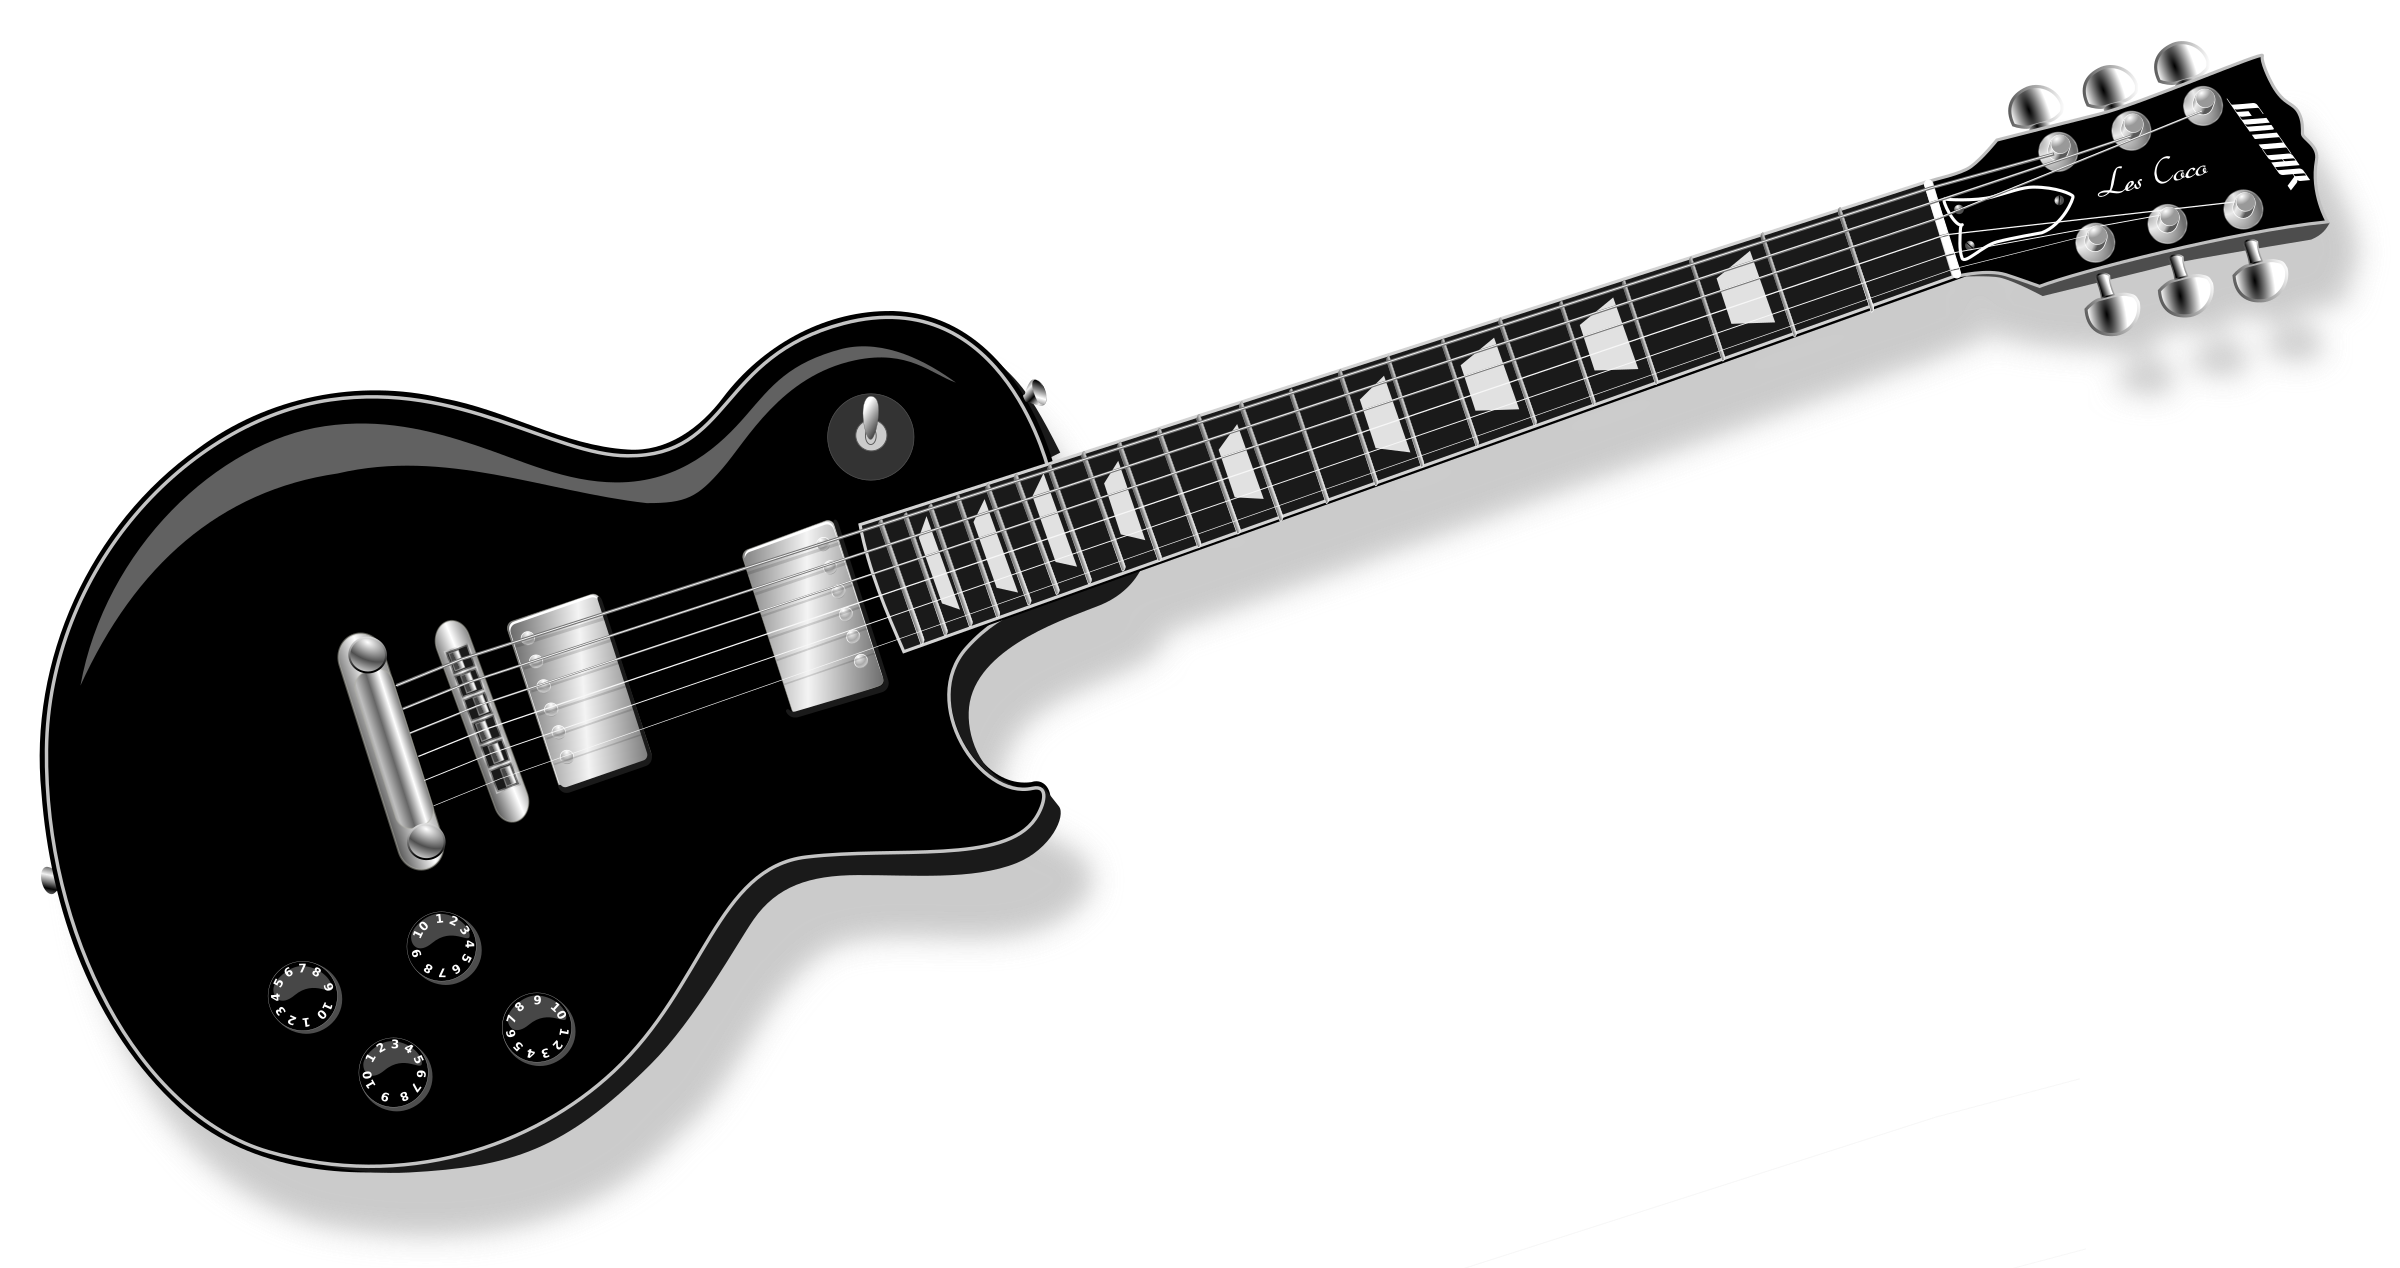 Clipart guitar cool guitar. Lp black big image